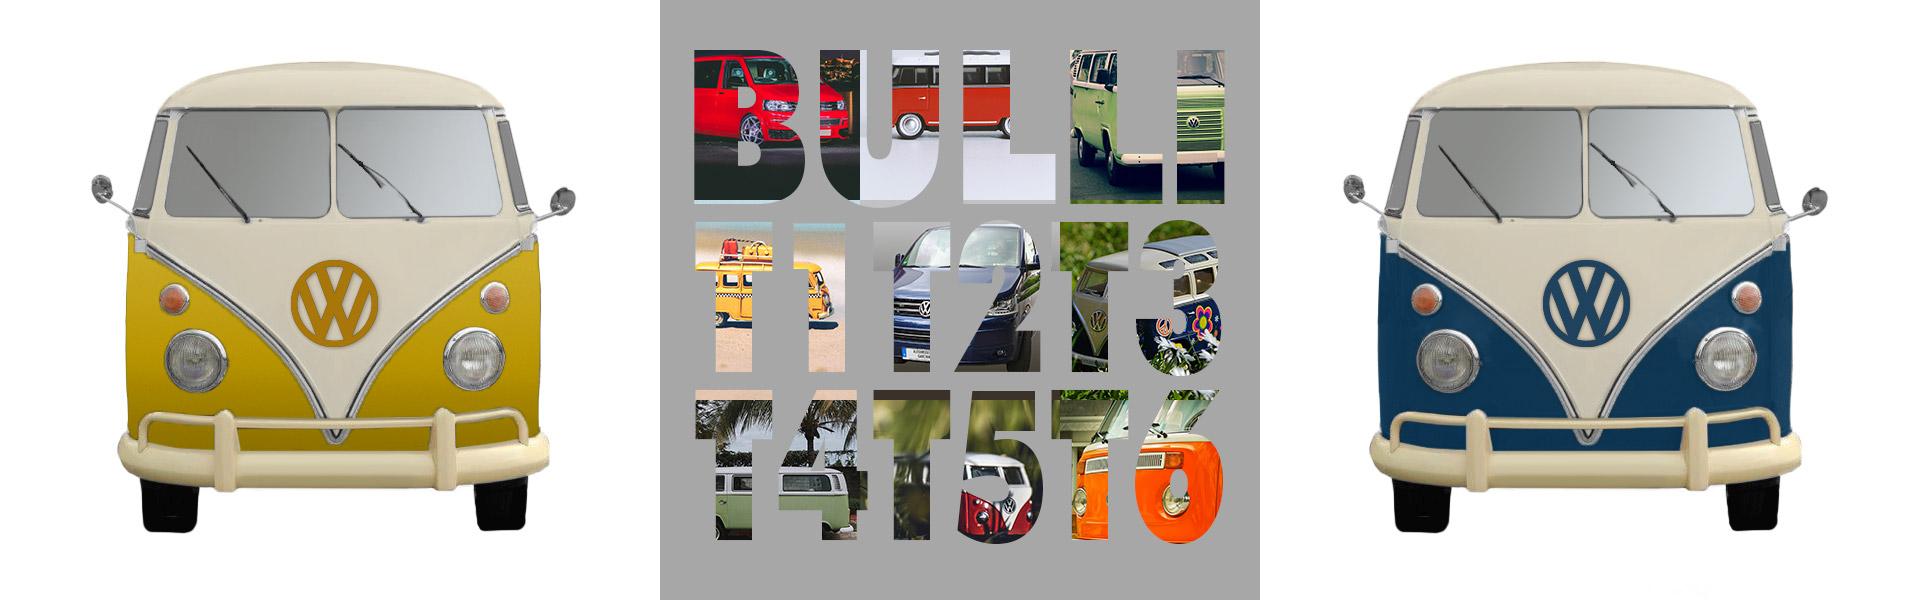 VW-Bus Reparaturen: VW T1, VW T2, VW T3, VW T4, VW T5, VW T6